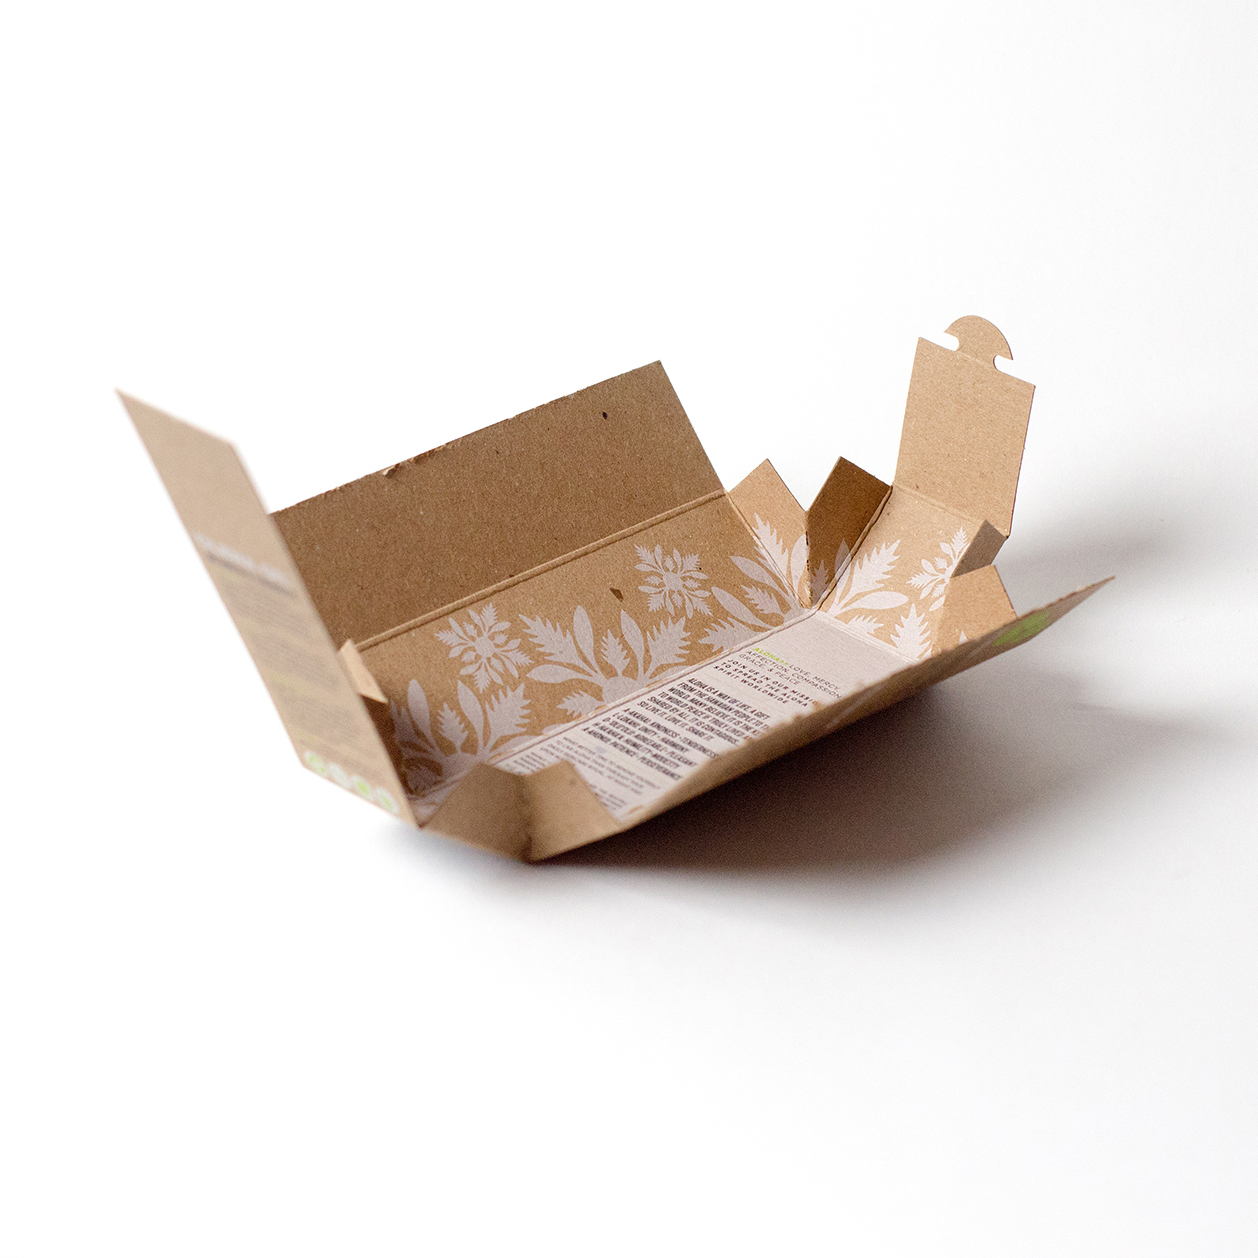 Aloha eco friendly packaging